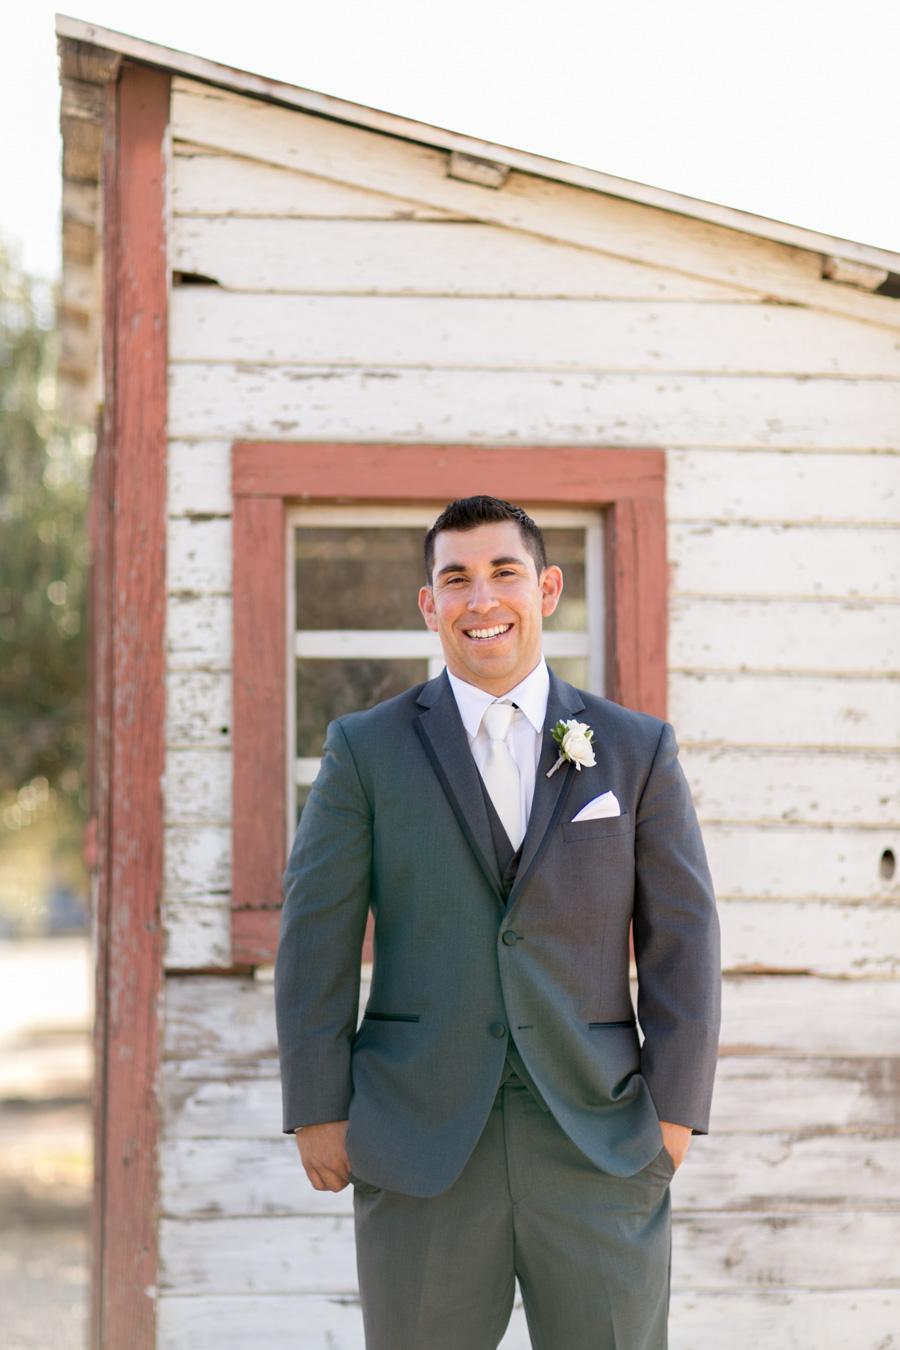 Groom at Santa Margarita Ranch wedding, weigh station